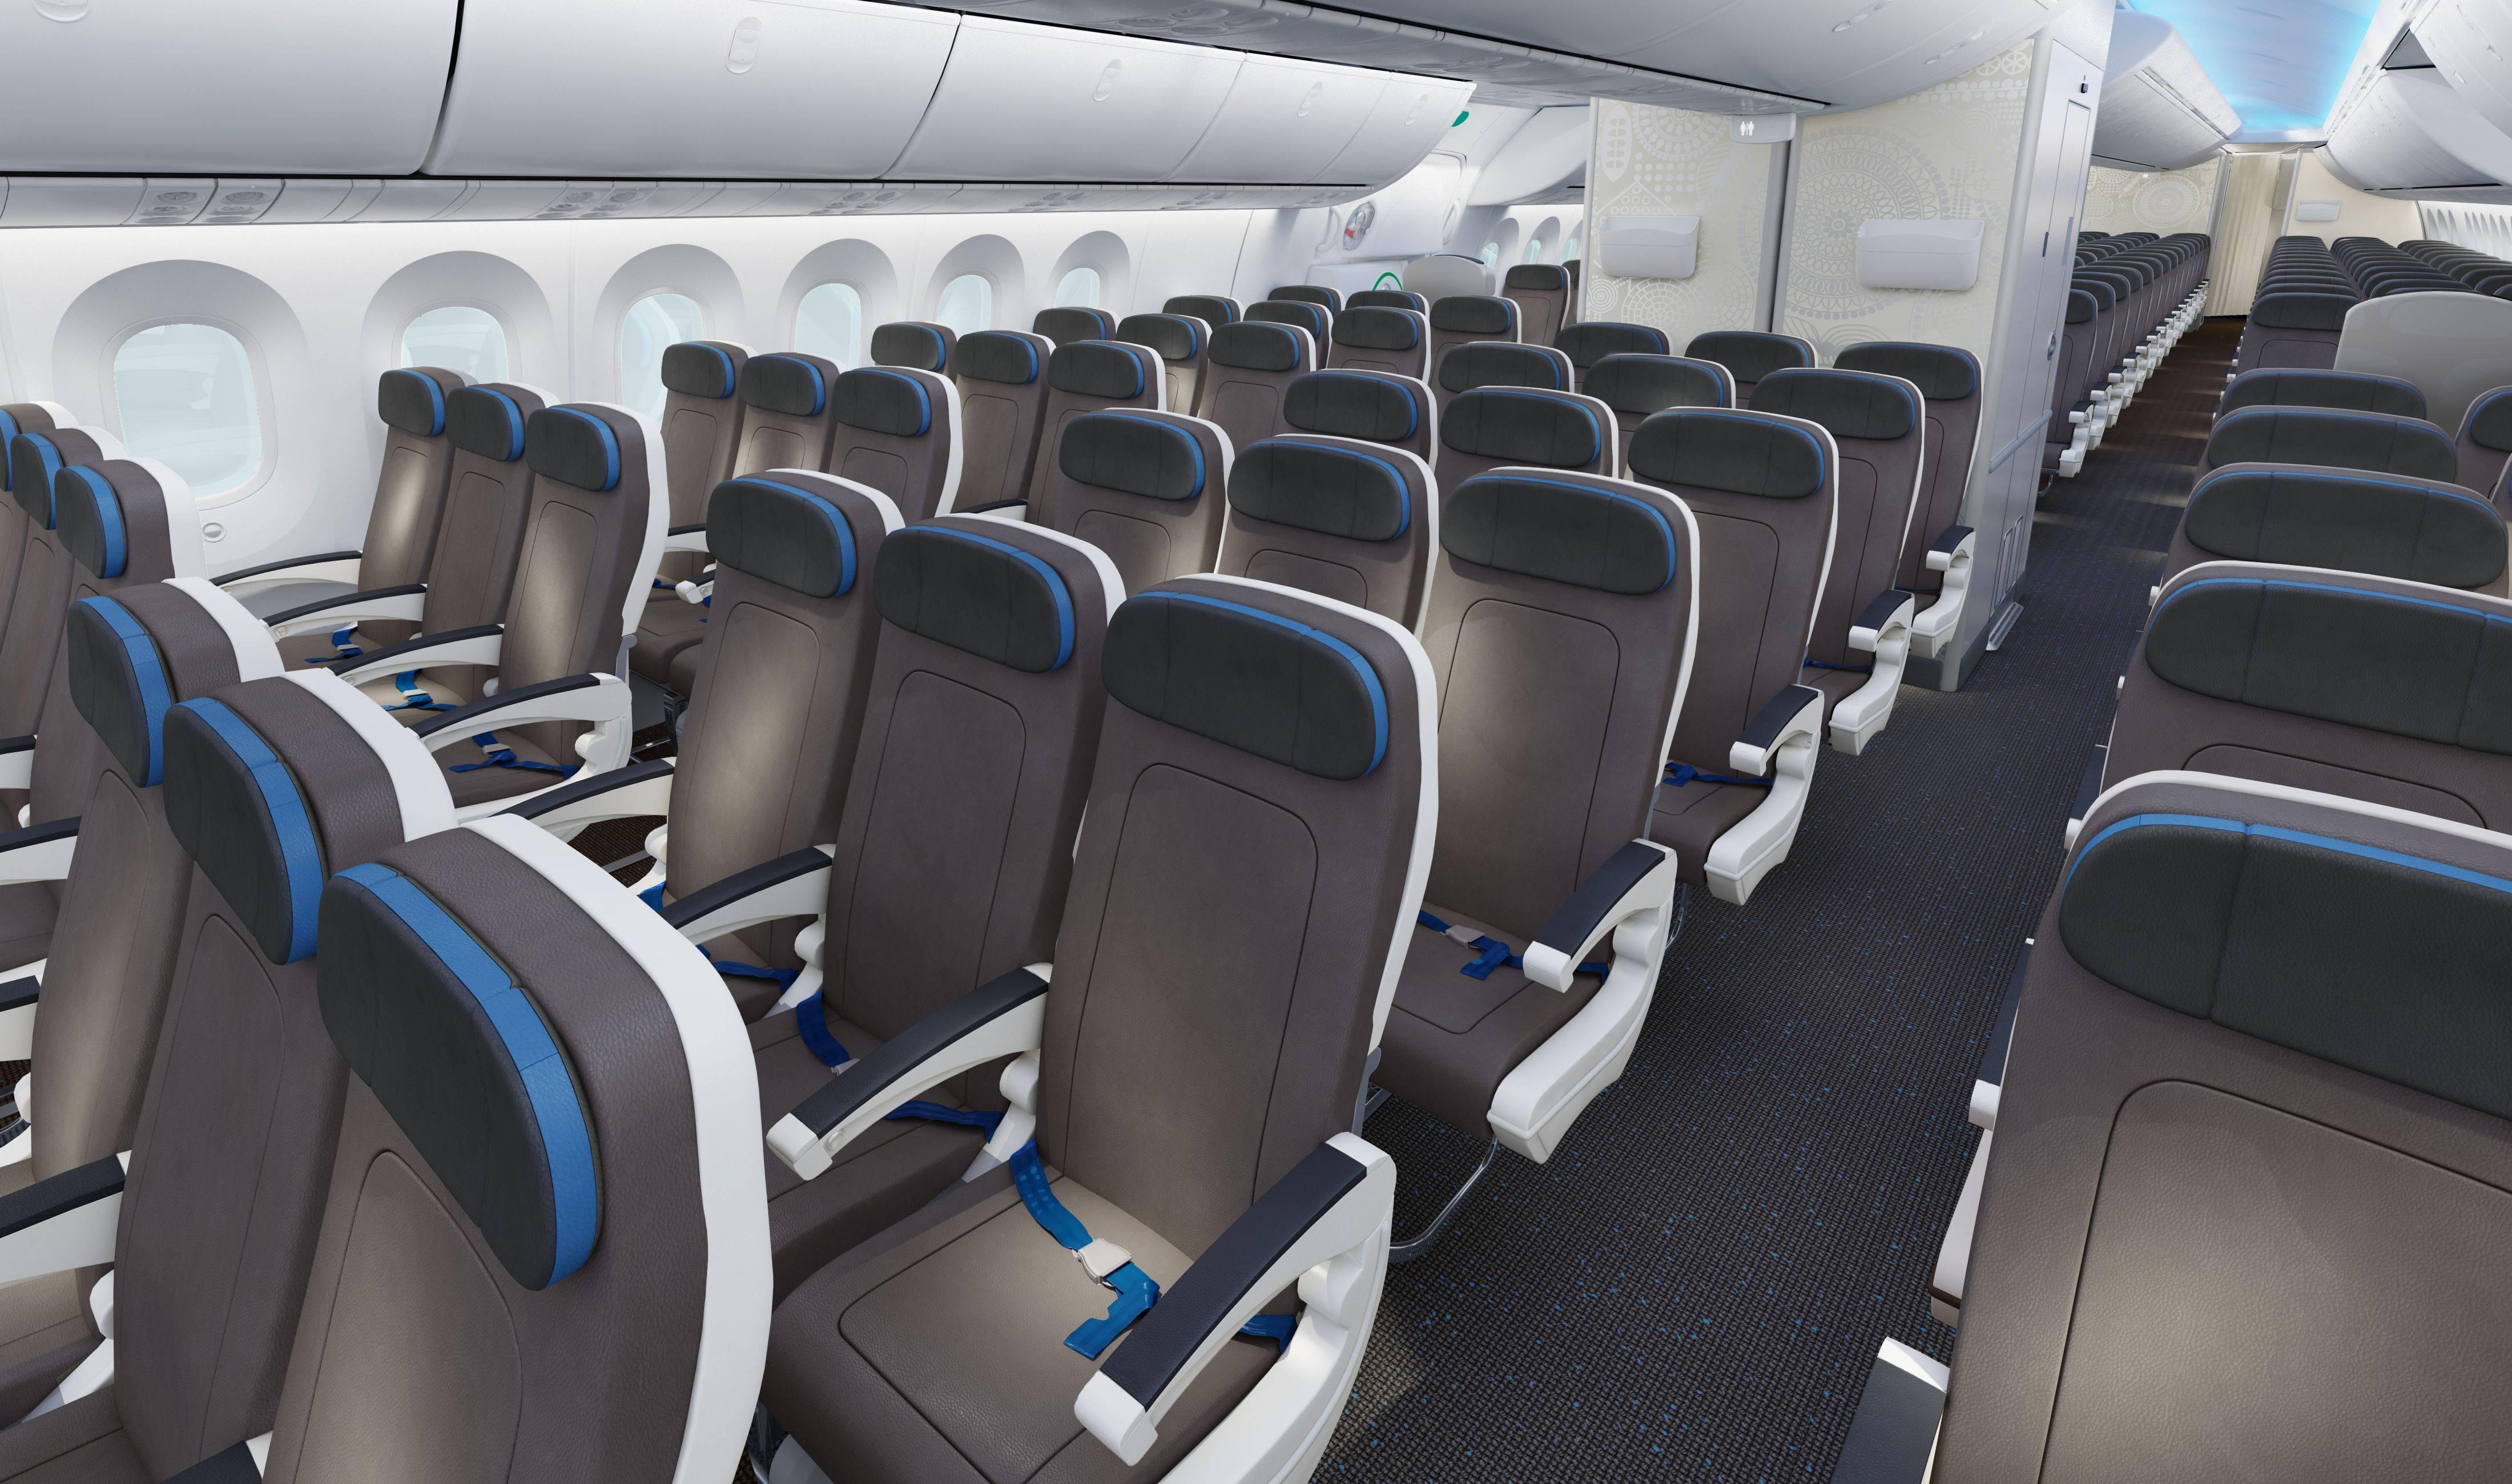 Все о салоне boeing 787 900 dreamliner: схема лучших мест в самолете